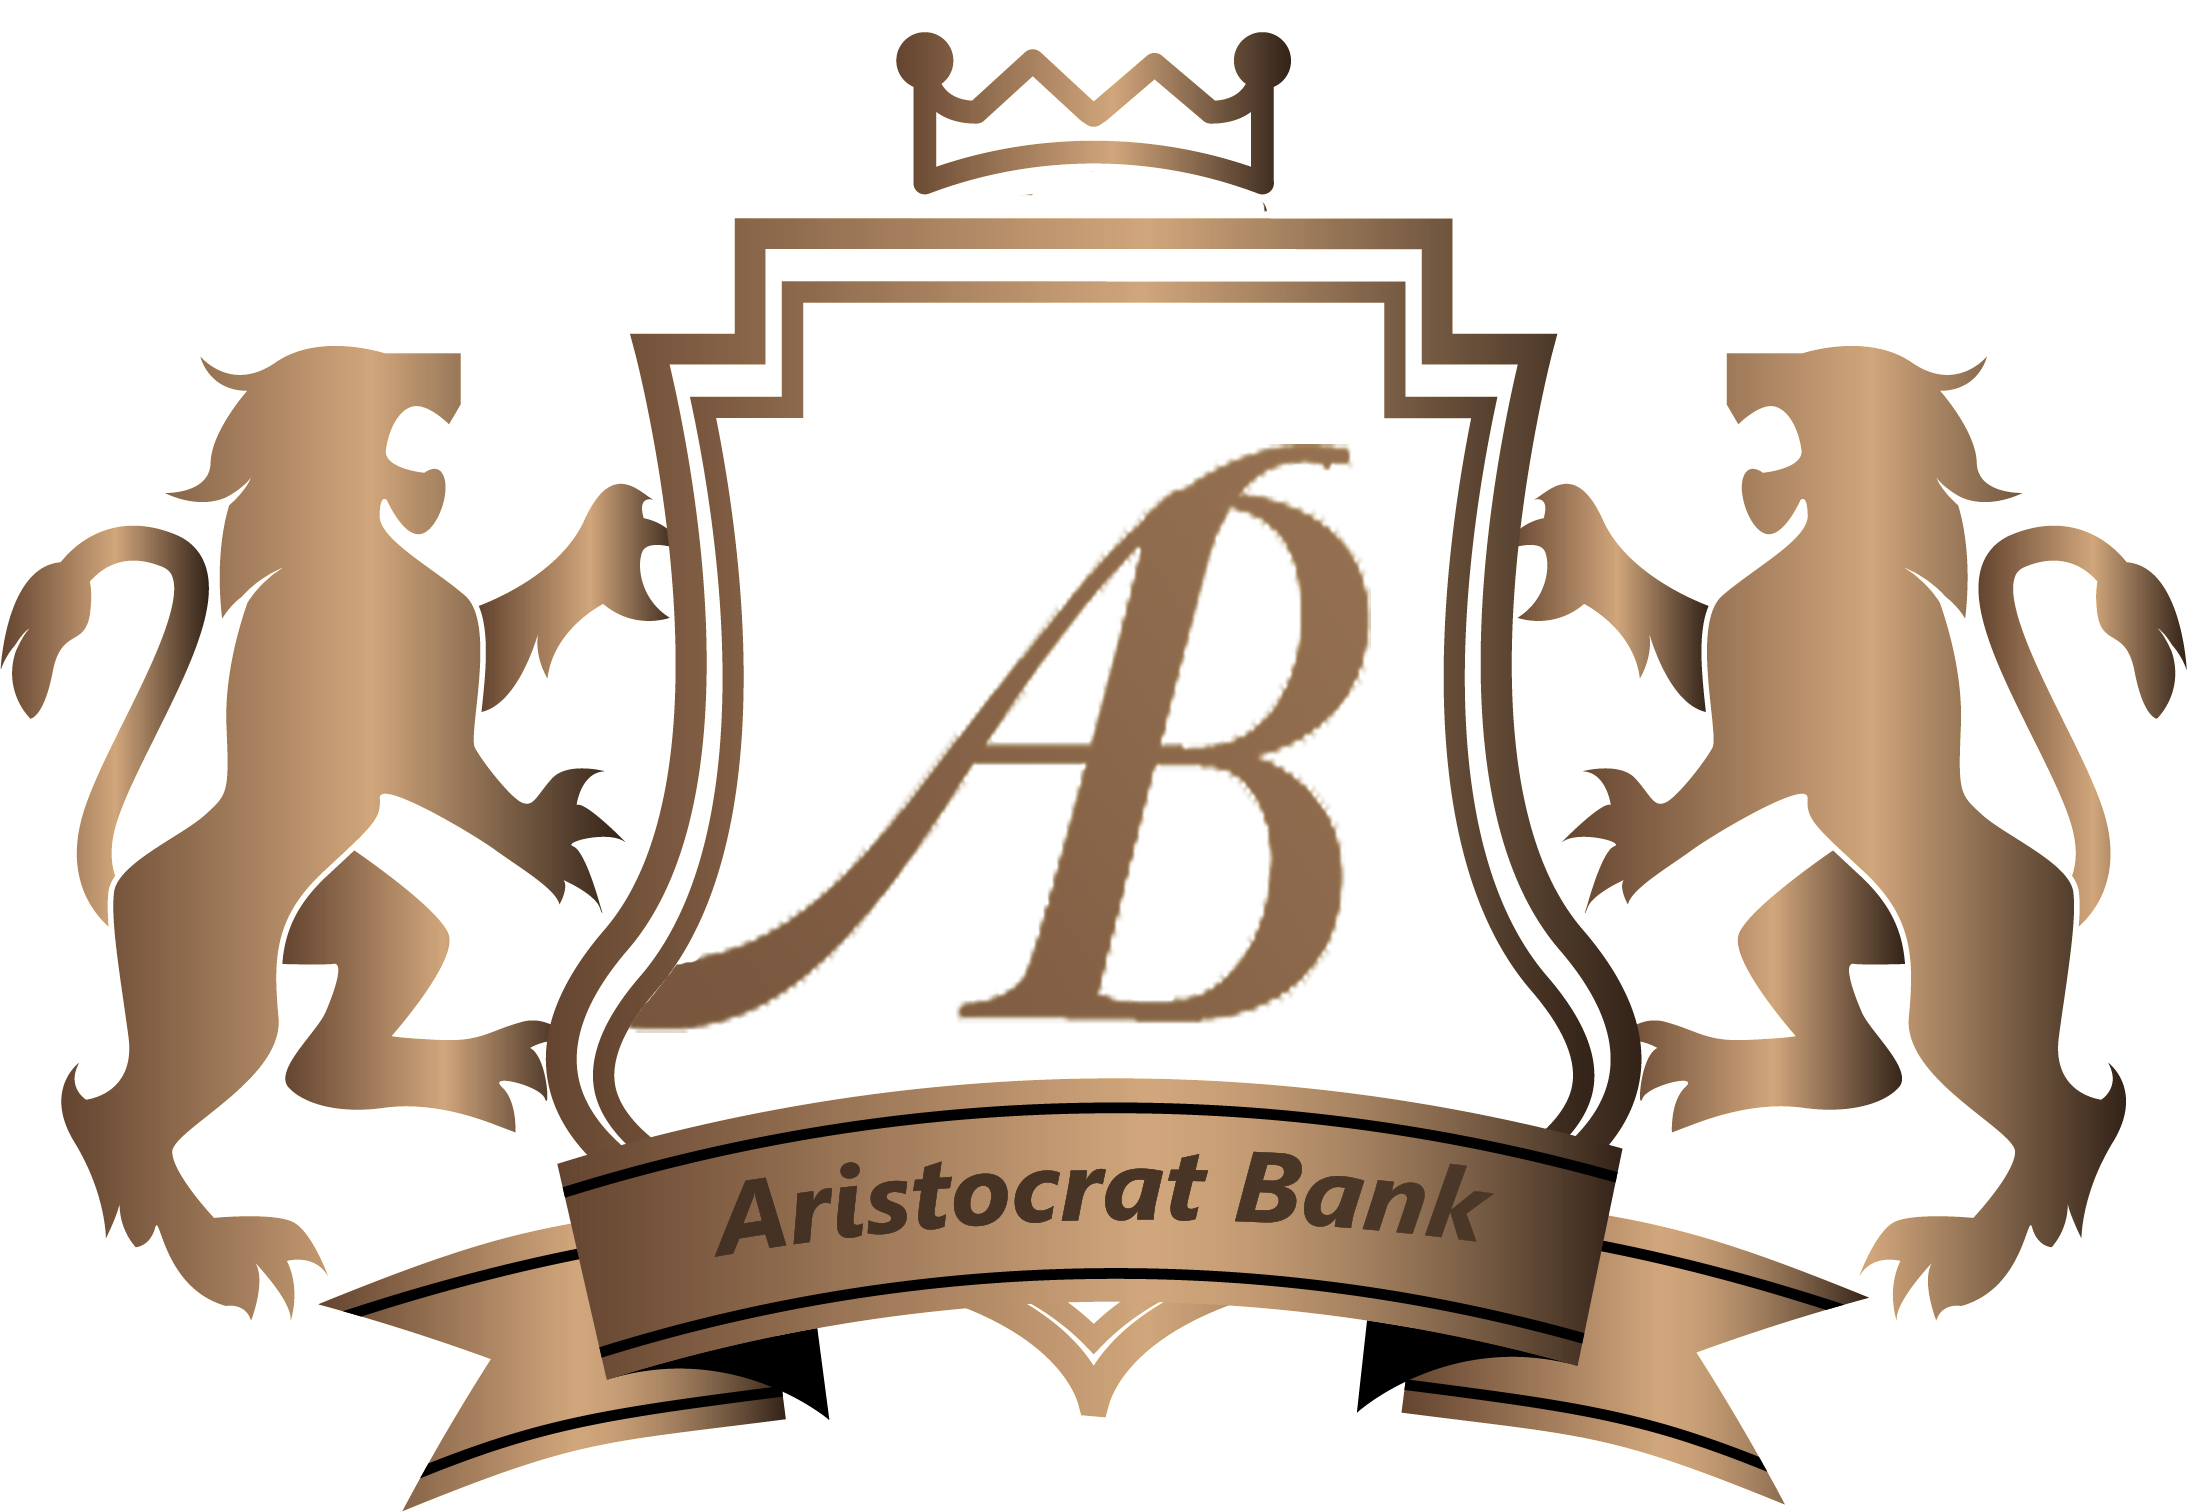 AristocratBank